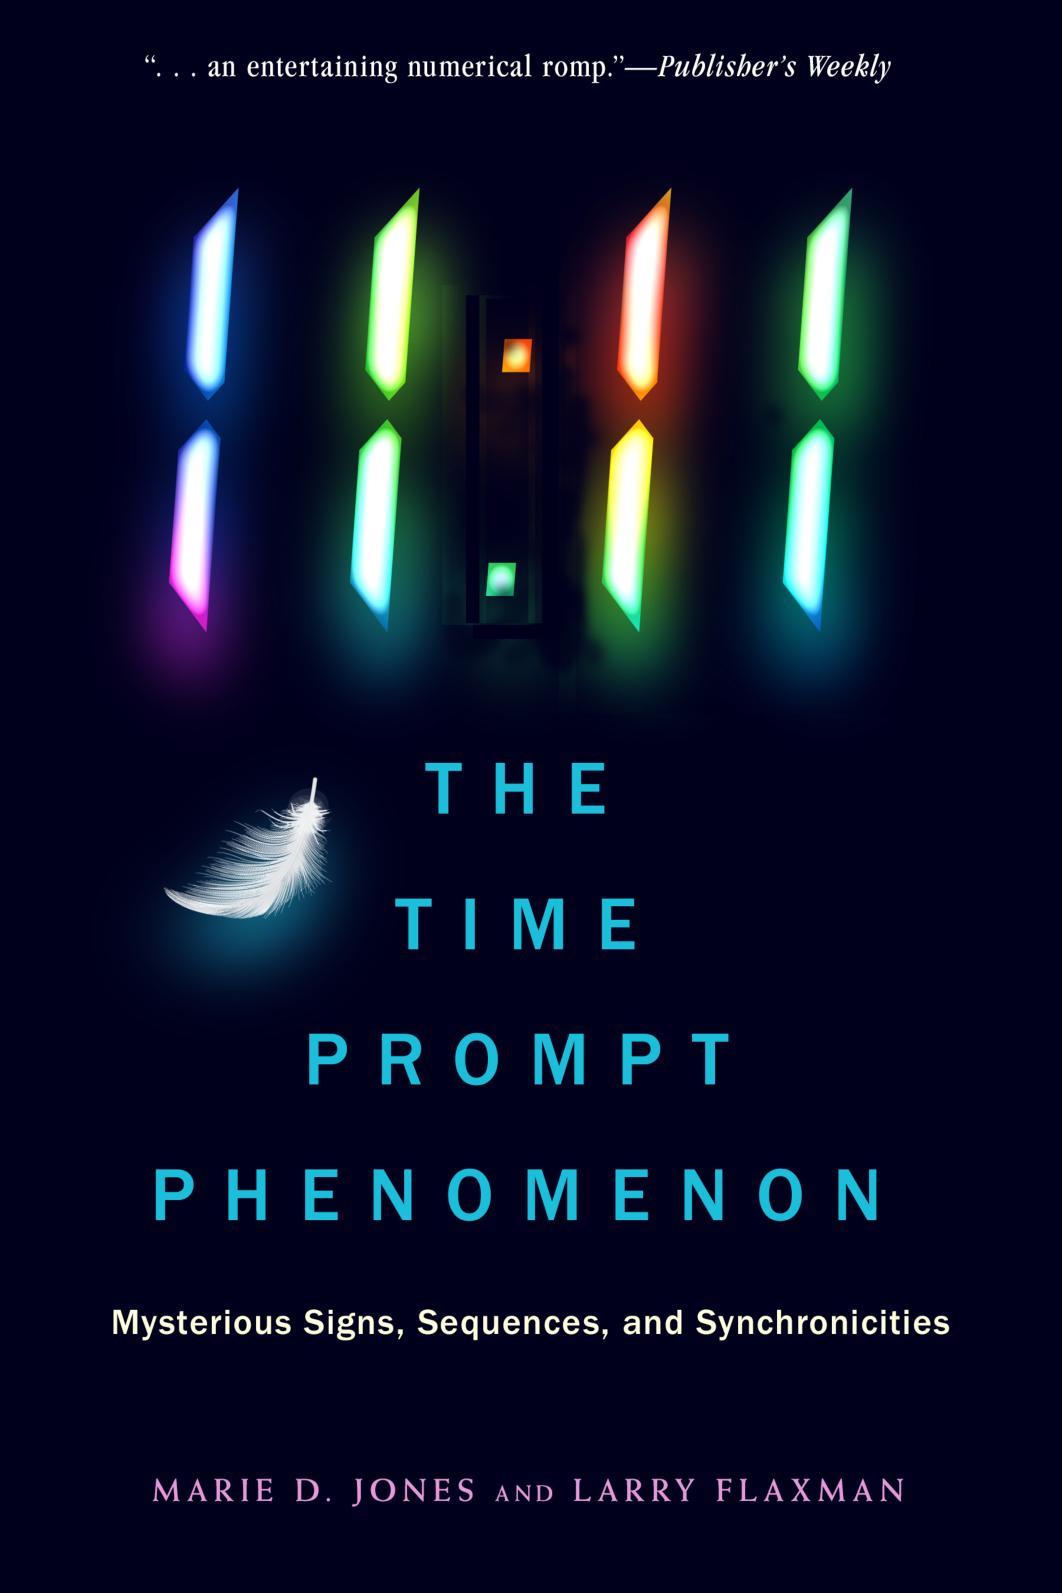 Calaméo - 11:11 The Time Prompt Phenomenon